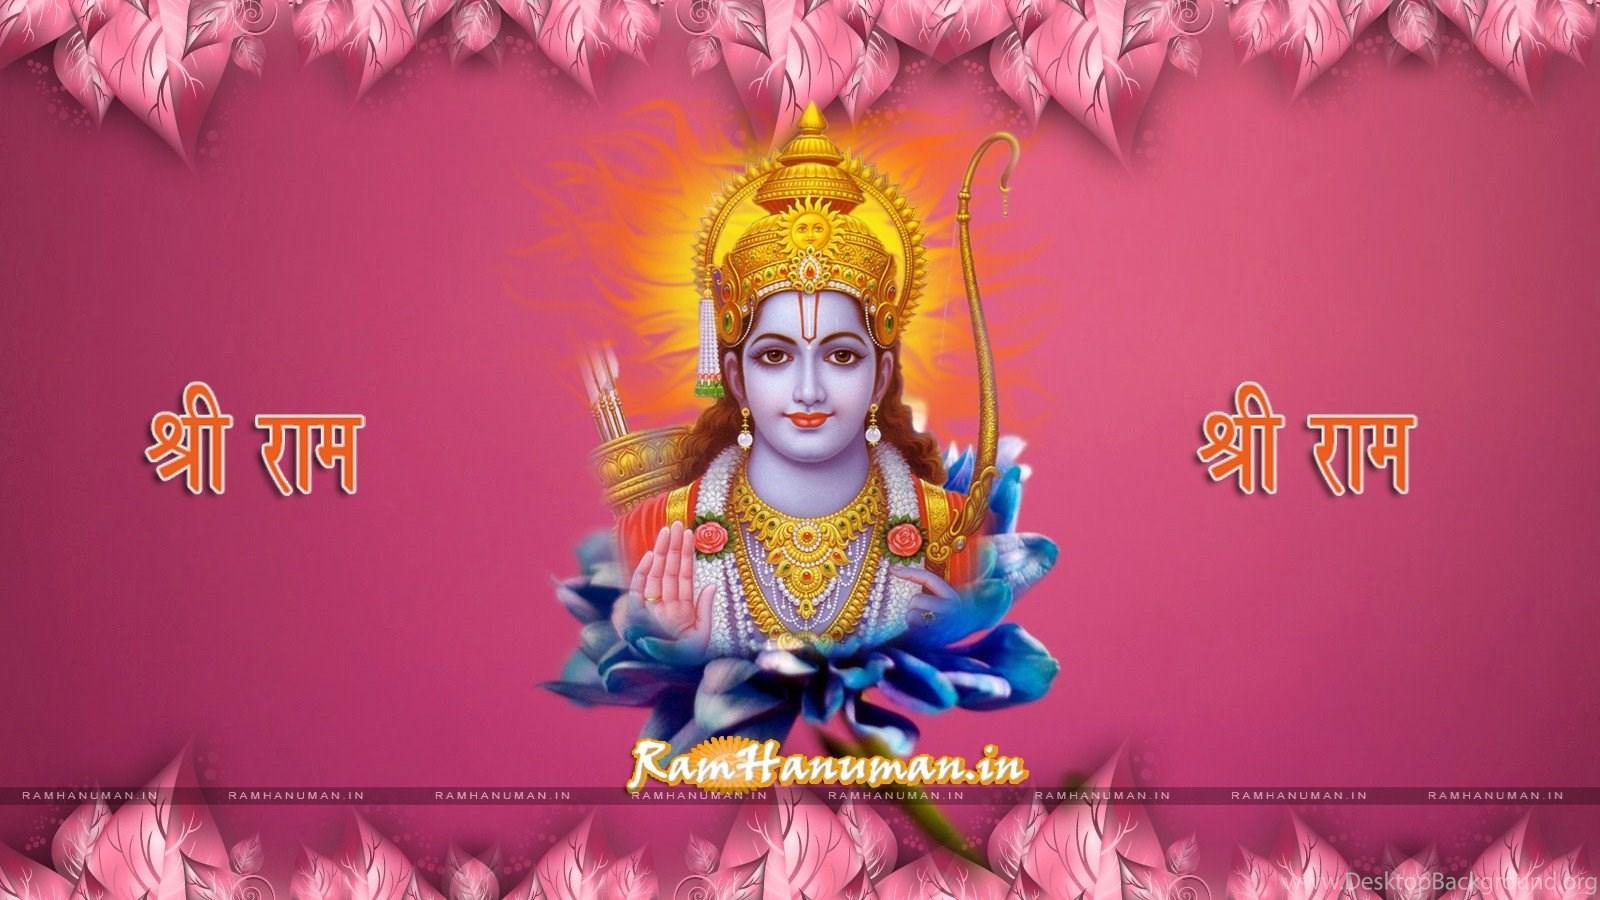 Must see Wallpaper Lord Ram Darbar - 1059304_best-hd-wallpapers-lord-shri-ram-full-wallpaper-hd-1418443366-jpg_1600x900_h  Gallery_707989.jpg